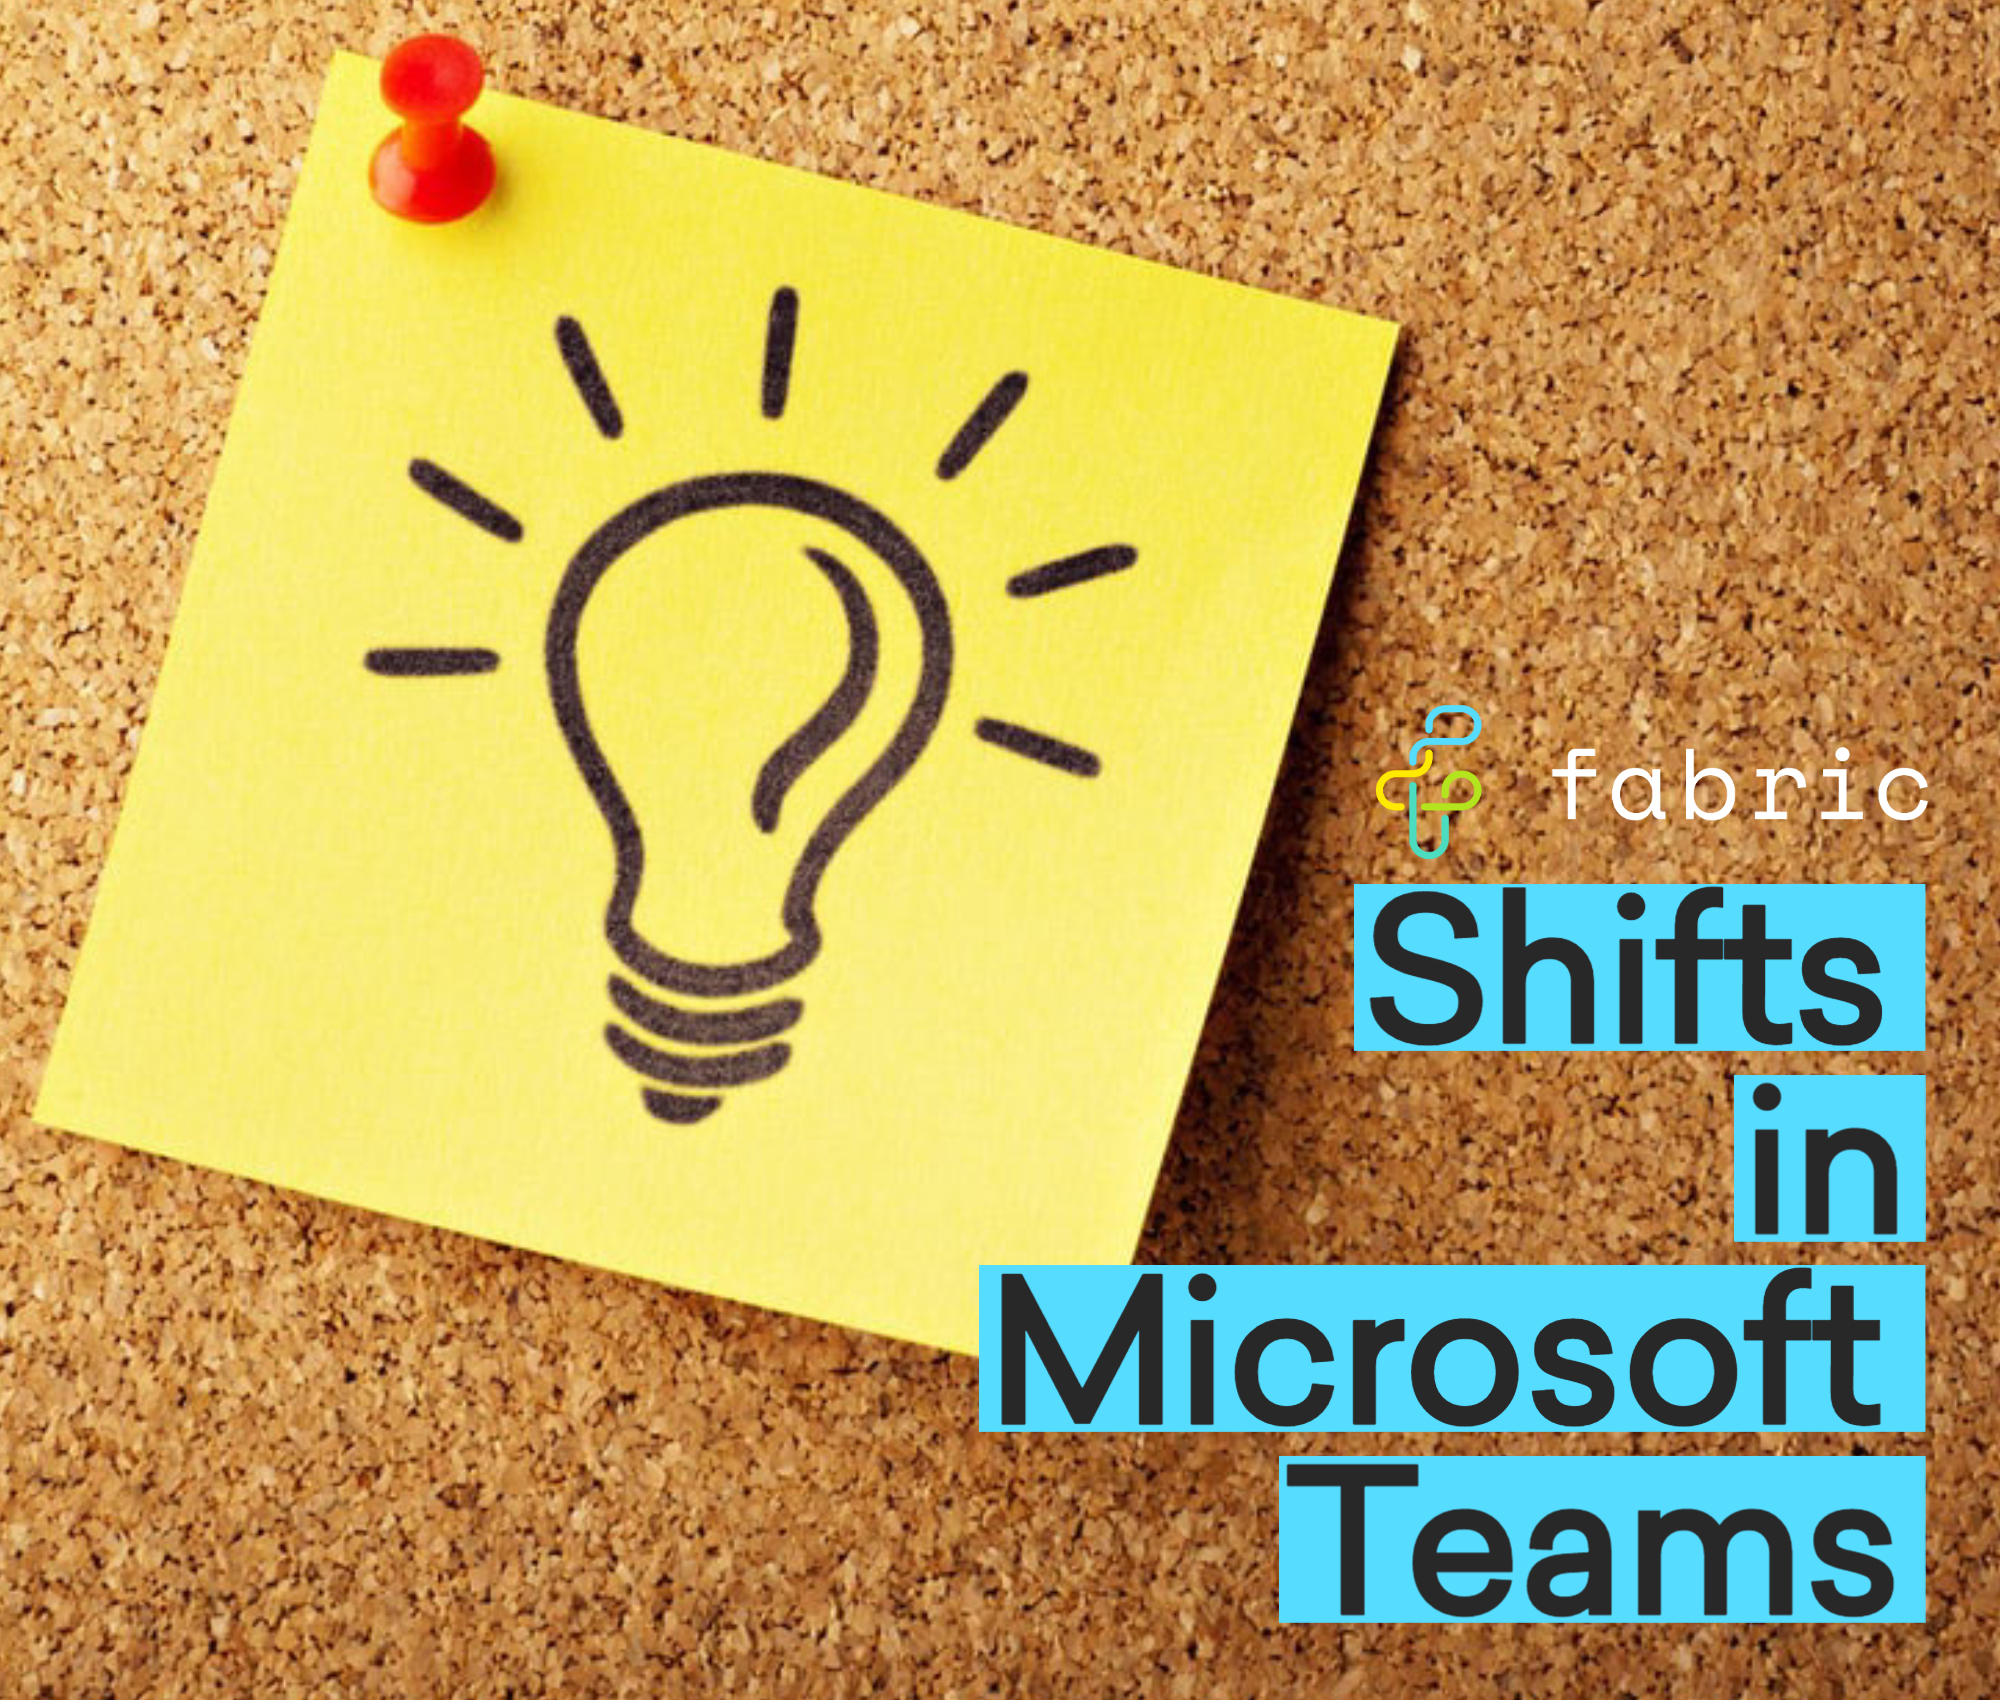 Shifts in Microsoft Teams Copy